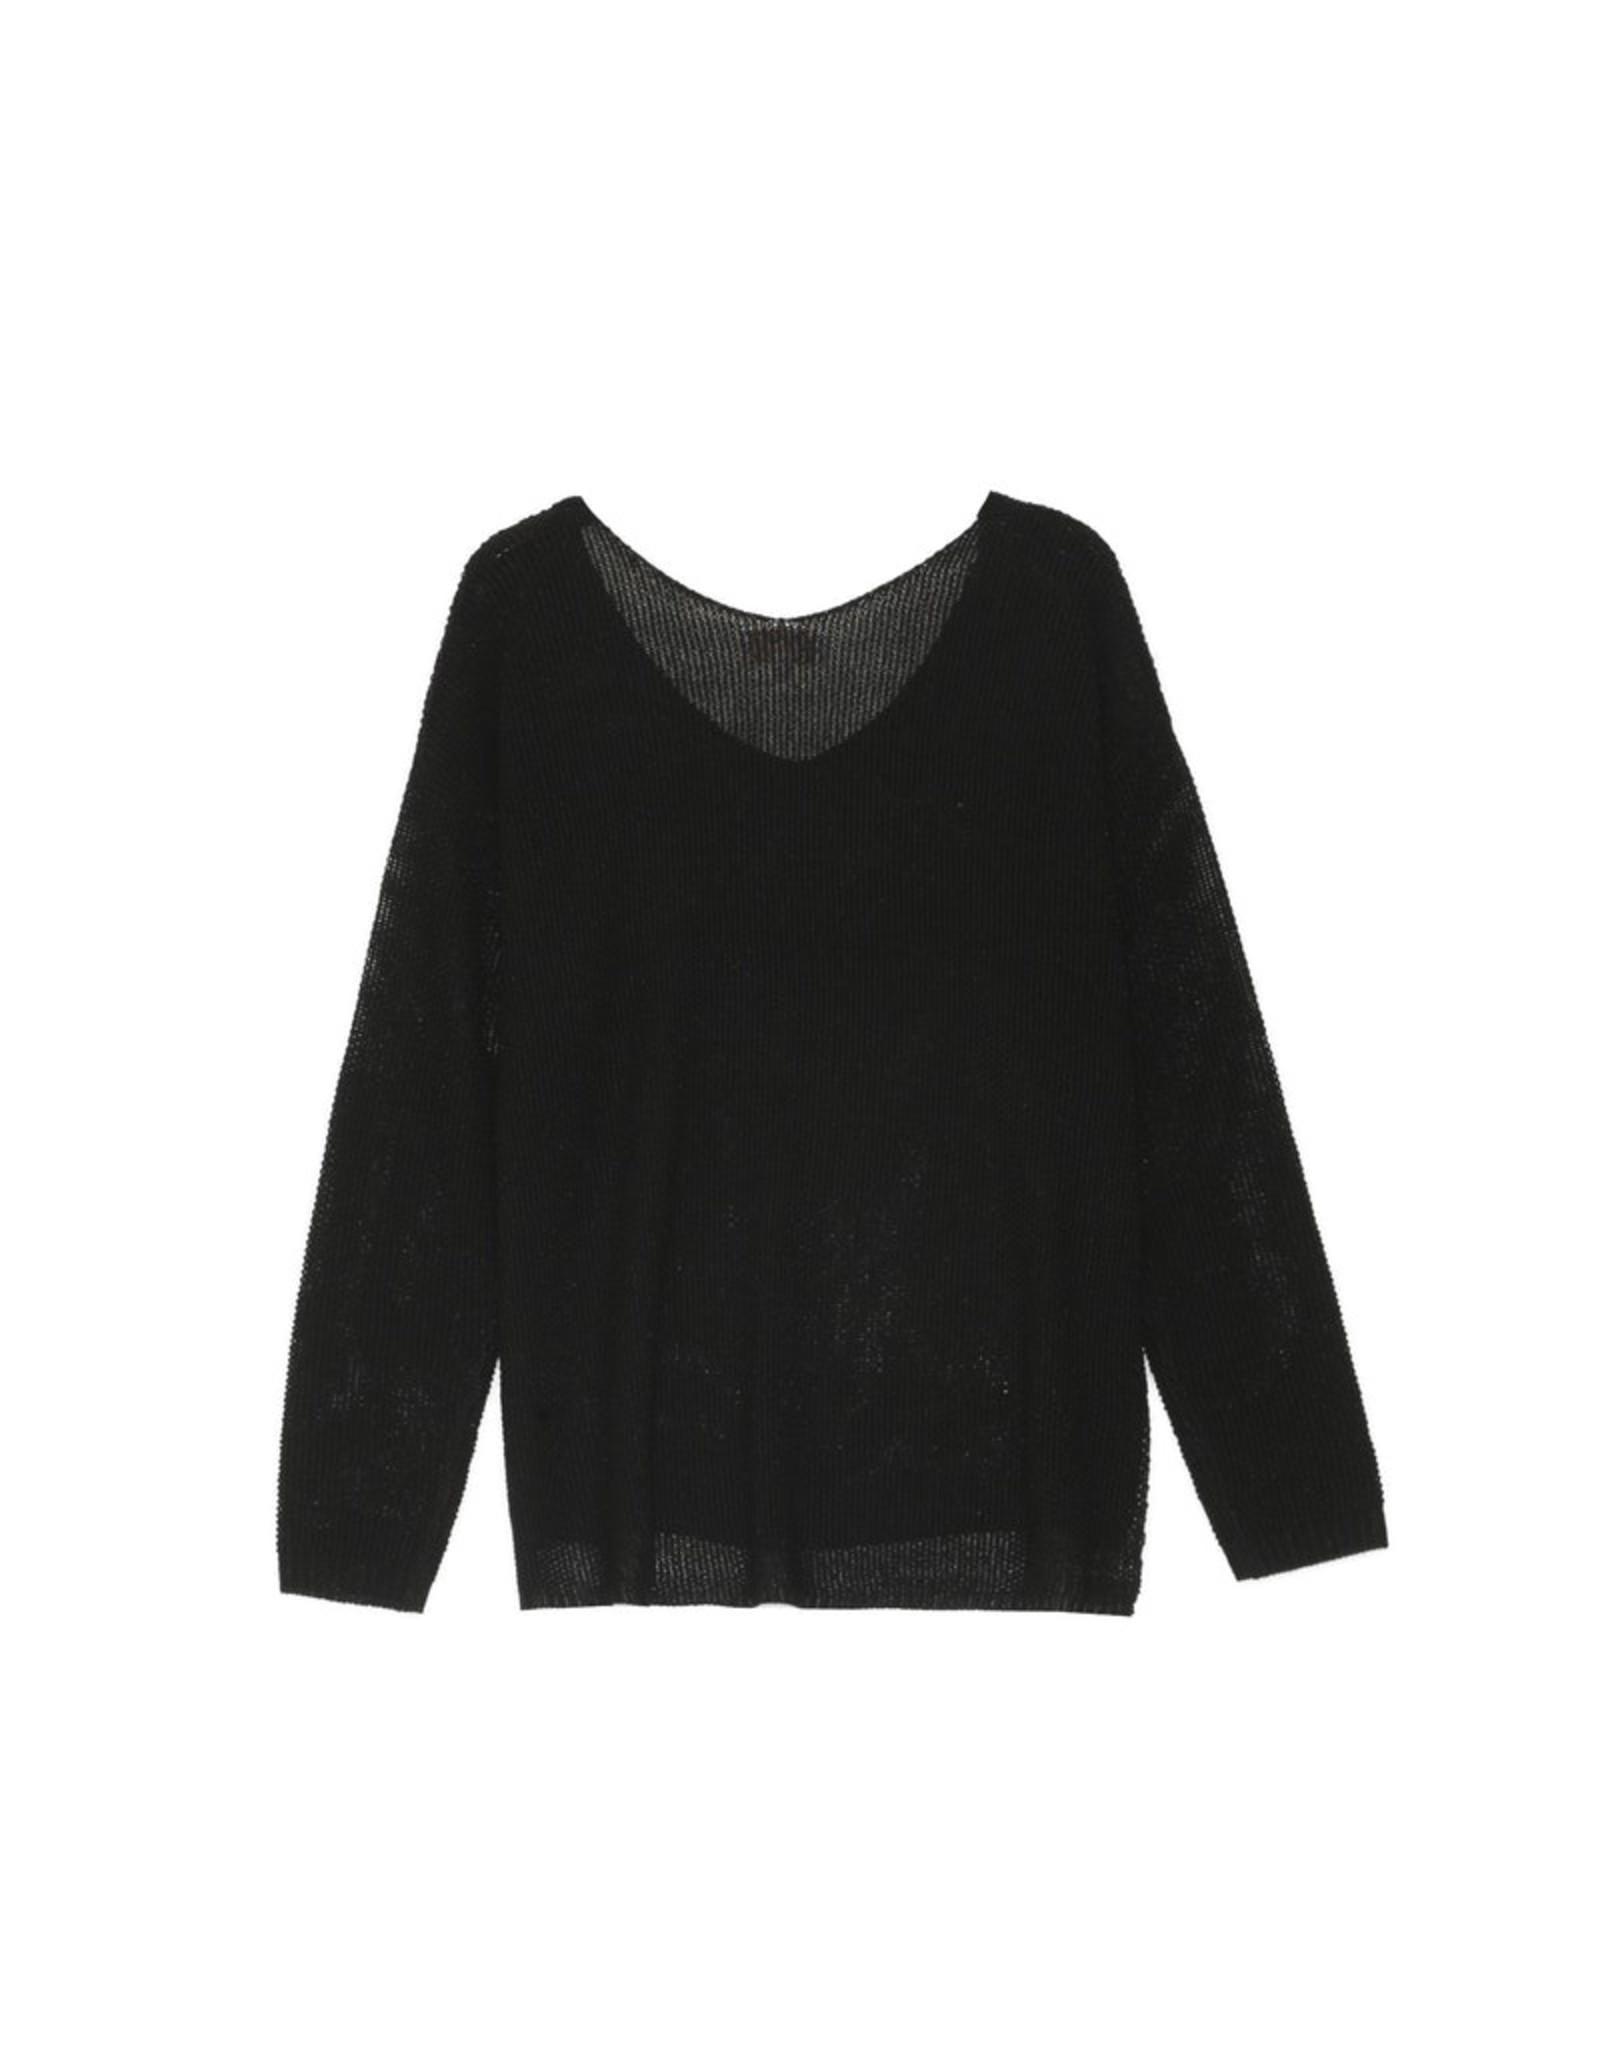 Grace & Mila Grace & Mila - Acacia sweater